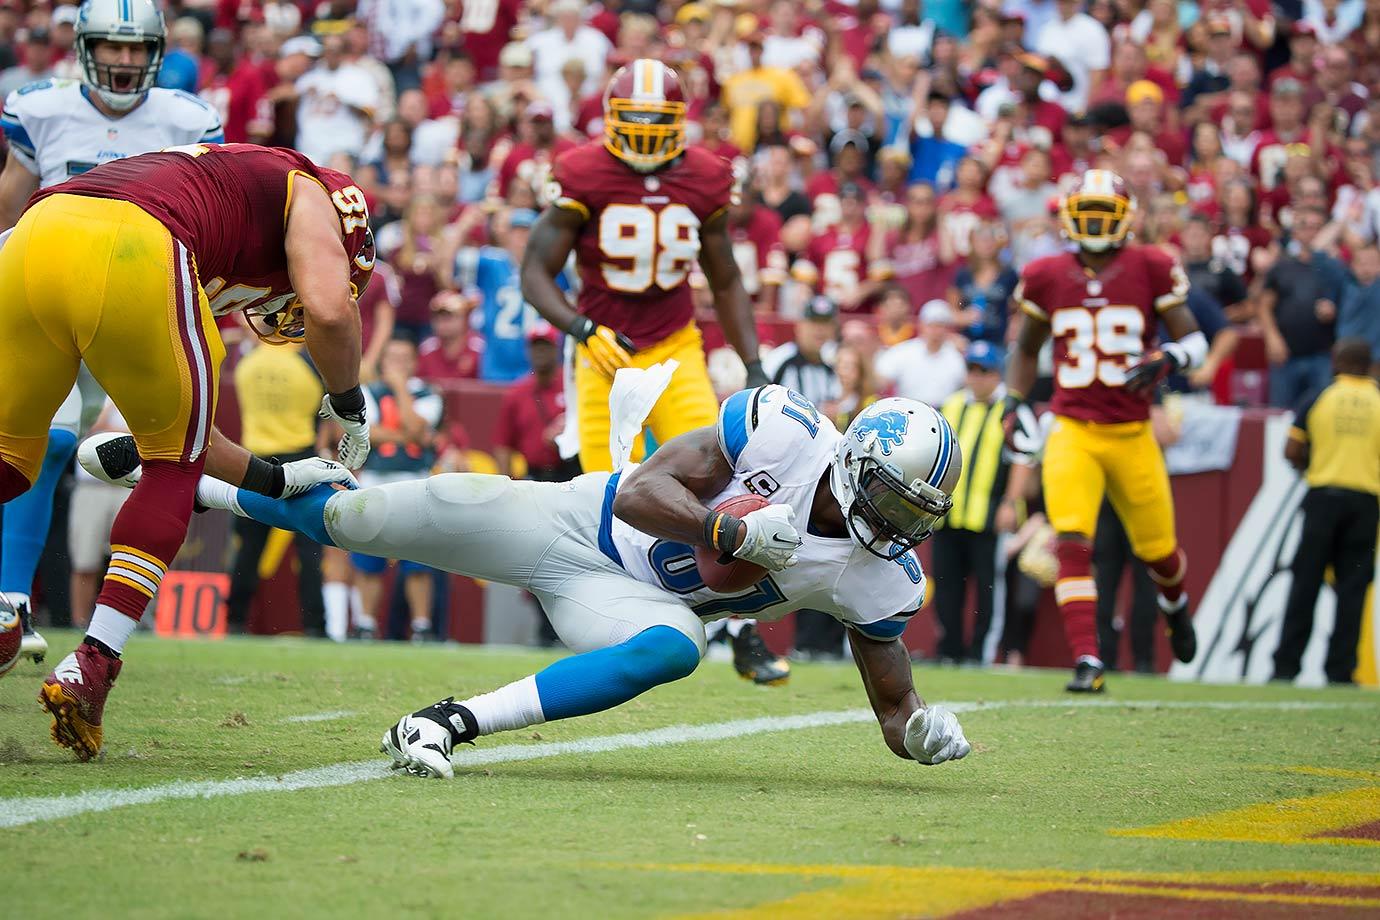 Sept. 22, 2013 — Detroit Lions vs. Washington Redskins